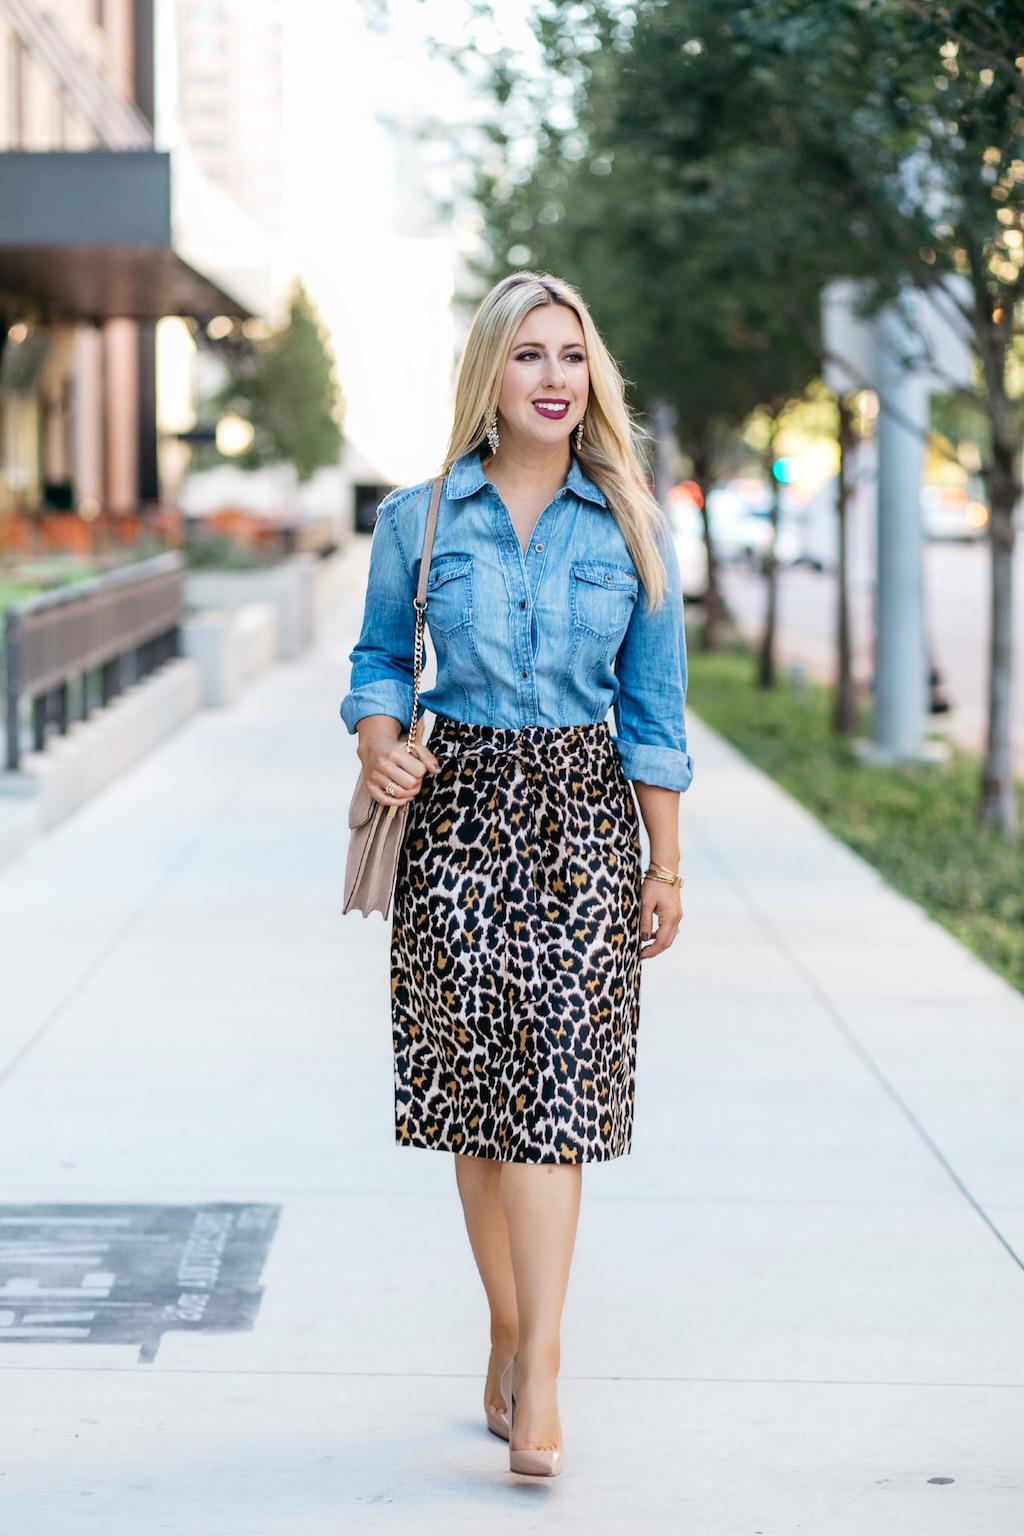 Fall Fashion | Leopard Print | Nicole Kirk